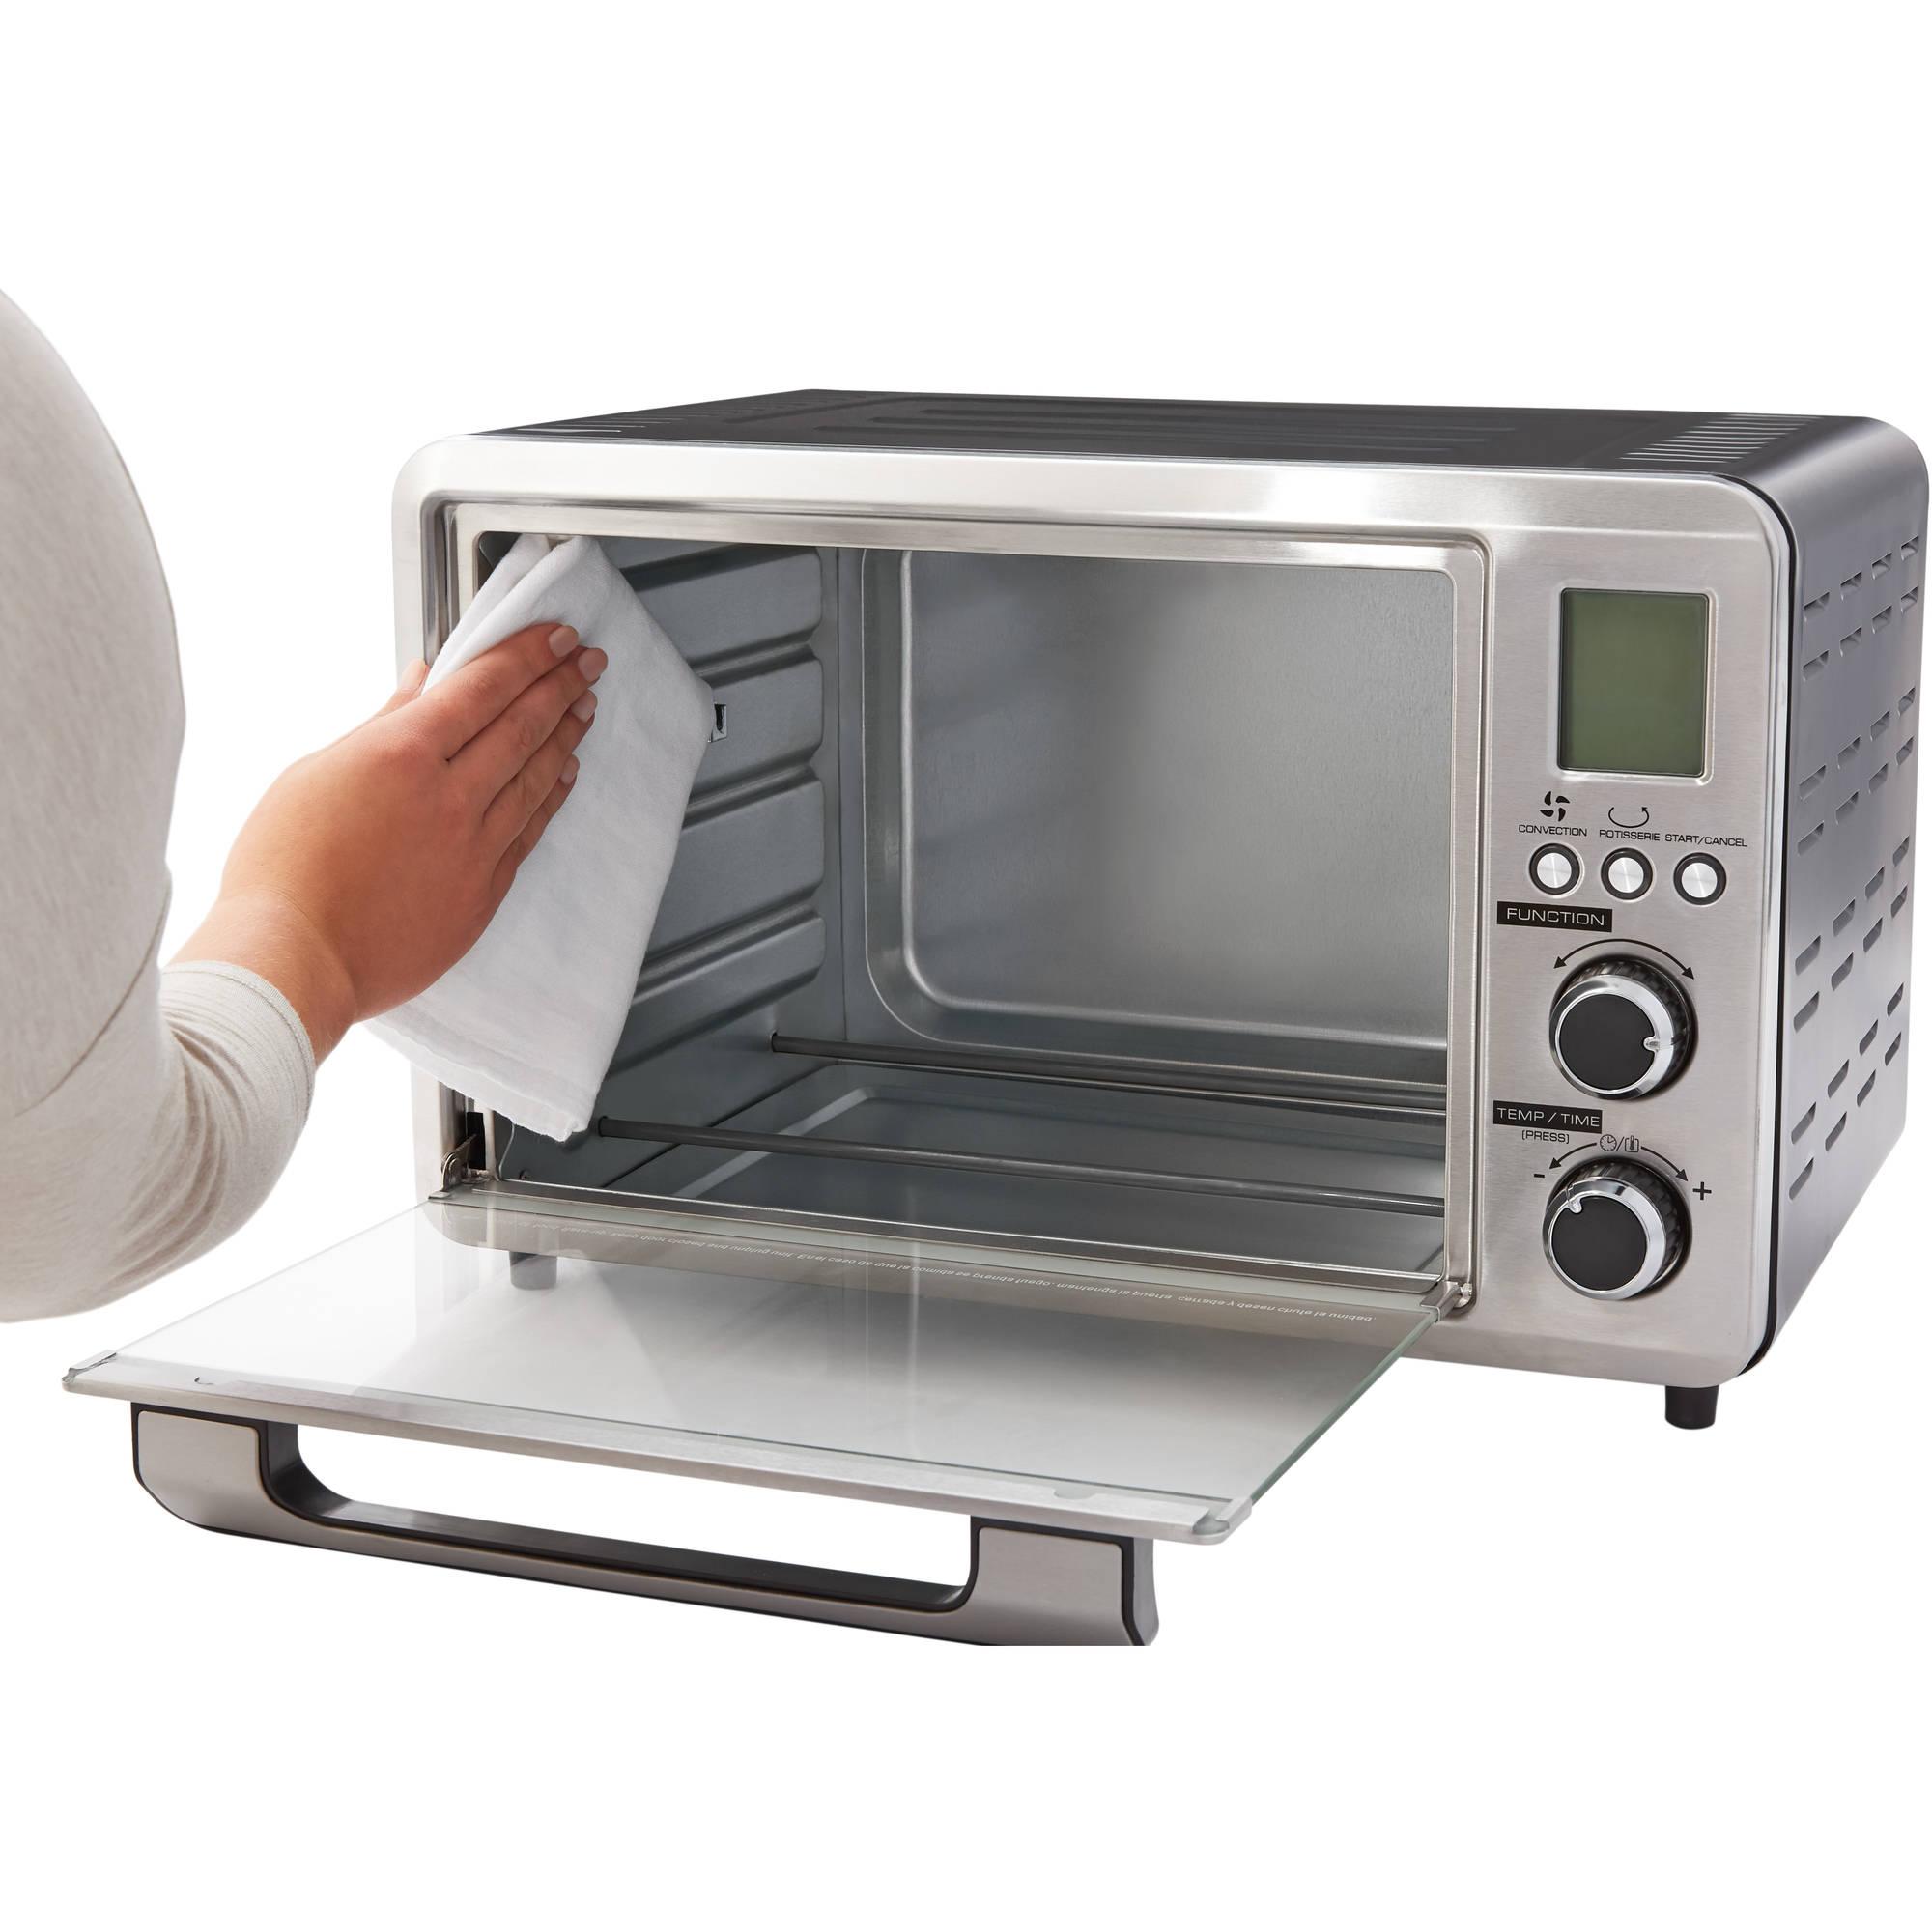 Farberware Digital Toaster Oven Best Toaster Ovens